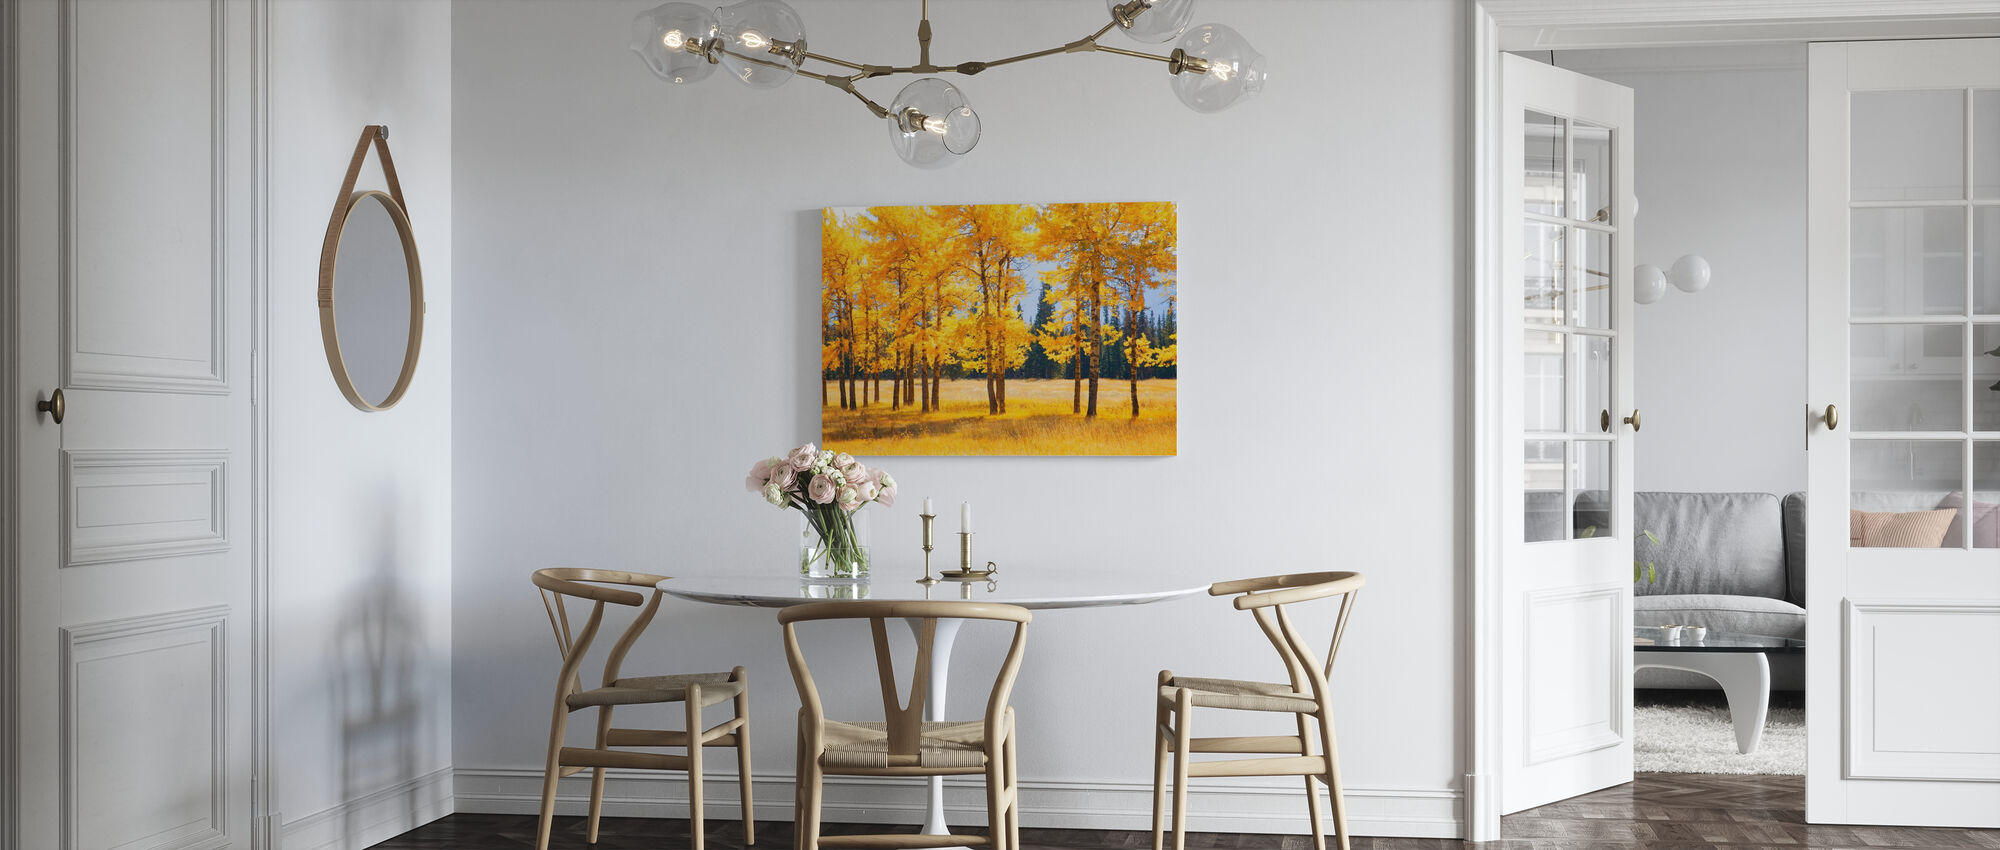 Yellow Autumn Trees - Canvas print - Kitchen